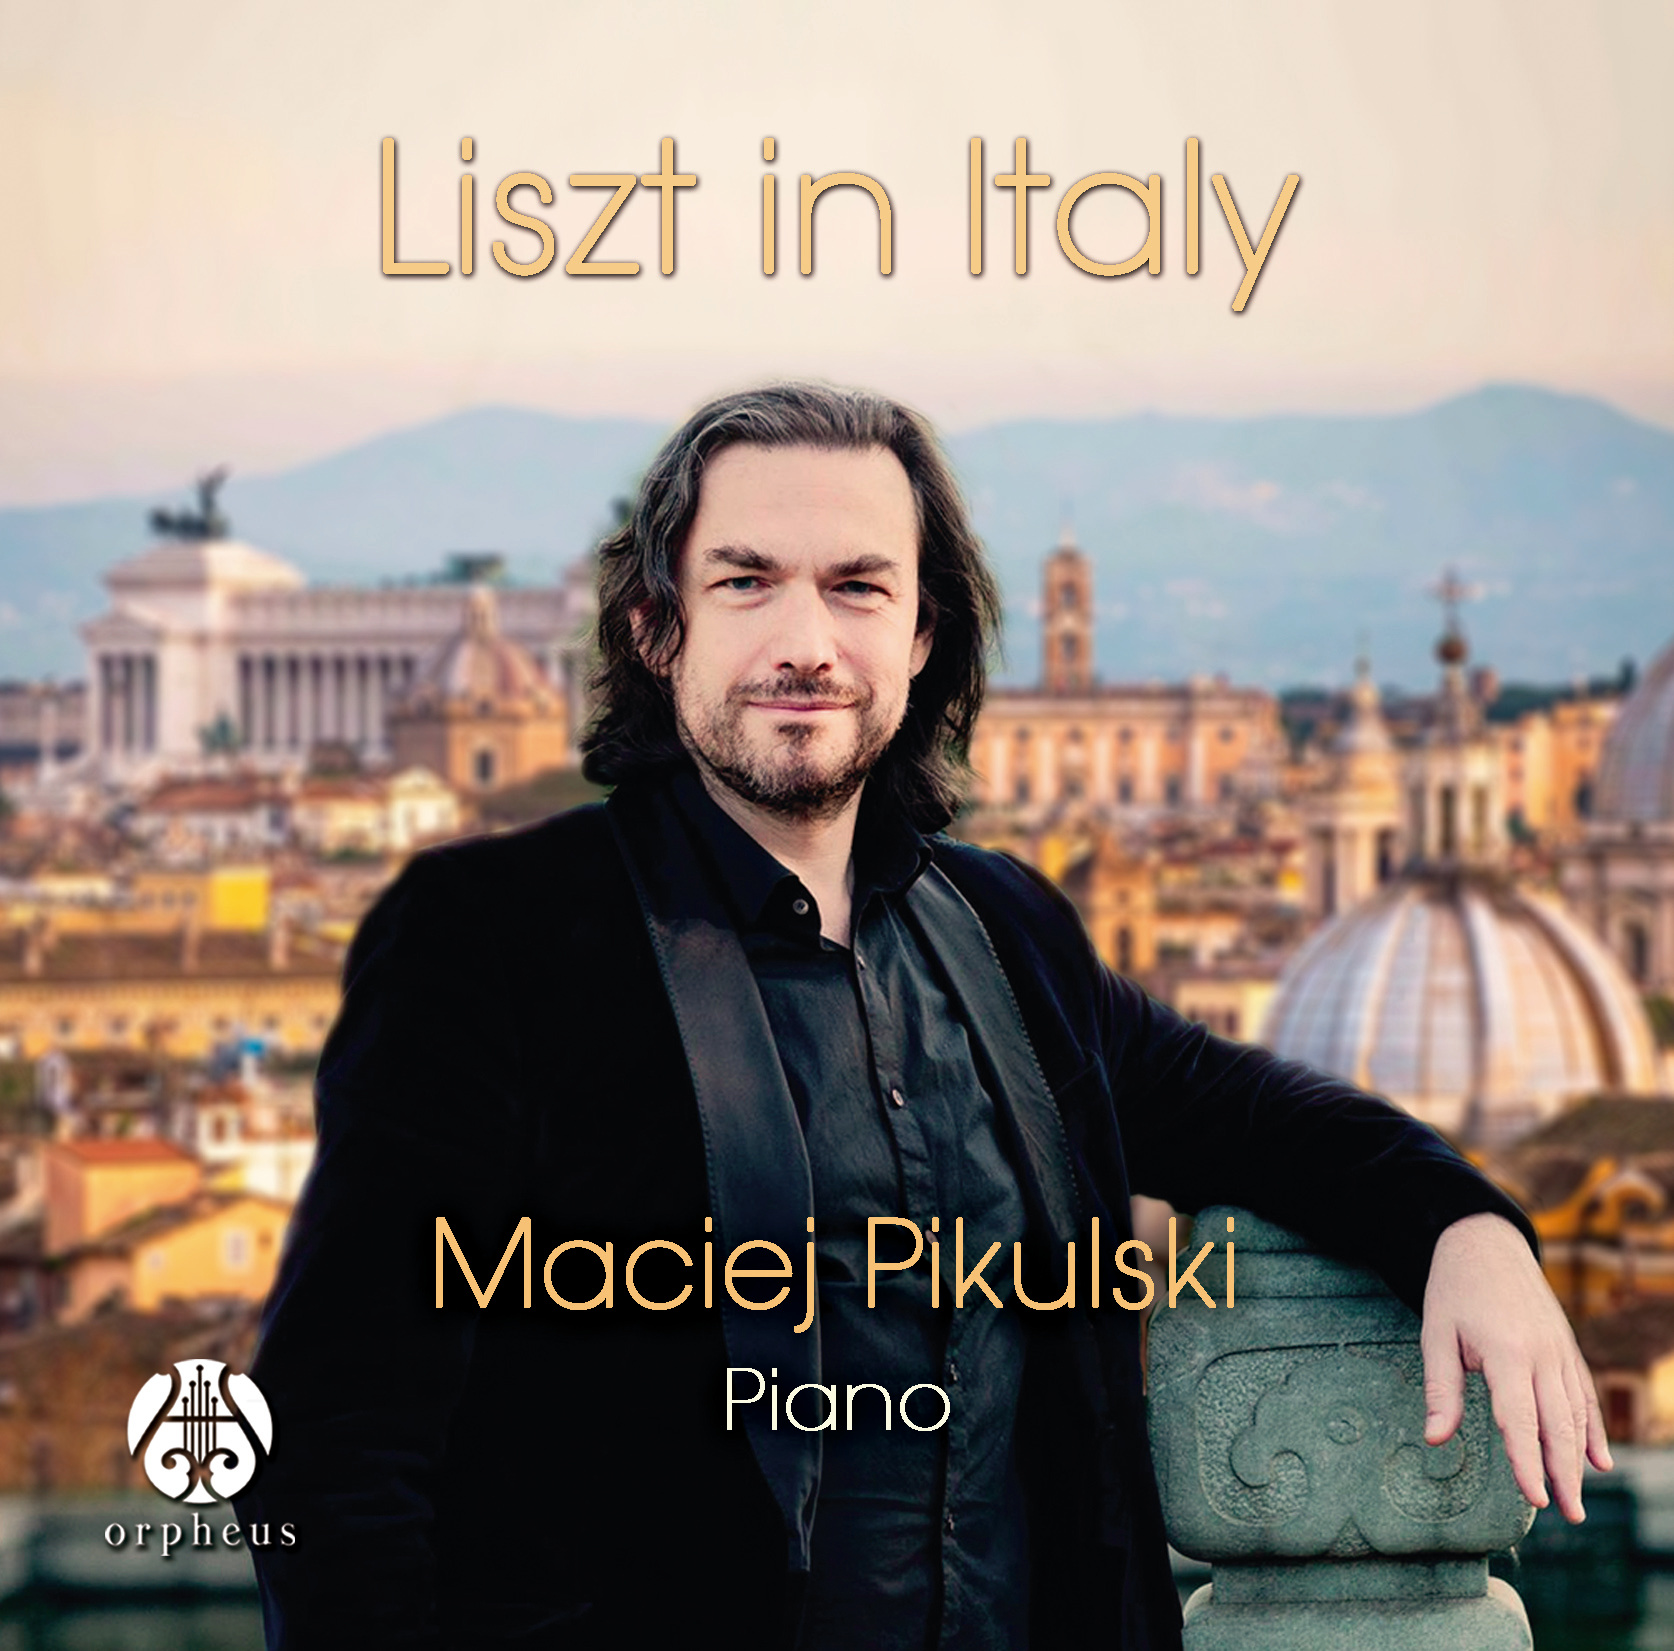 Liszt in Italy: Maciej Pikulski